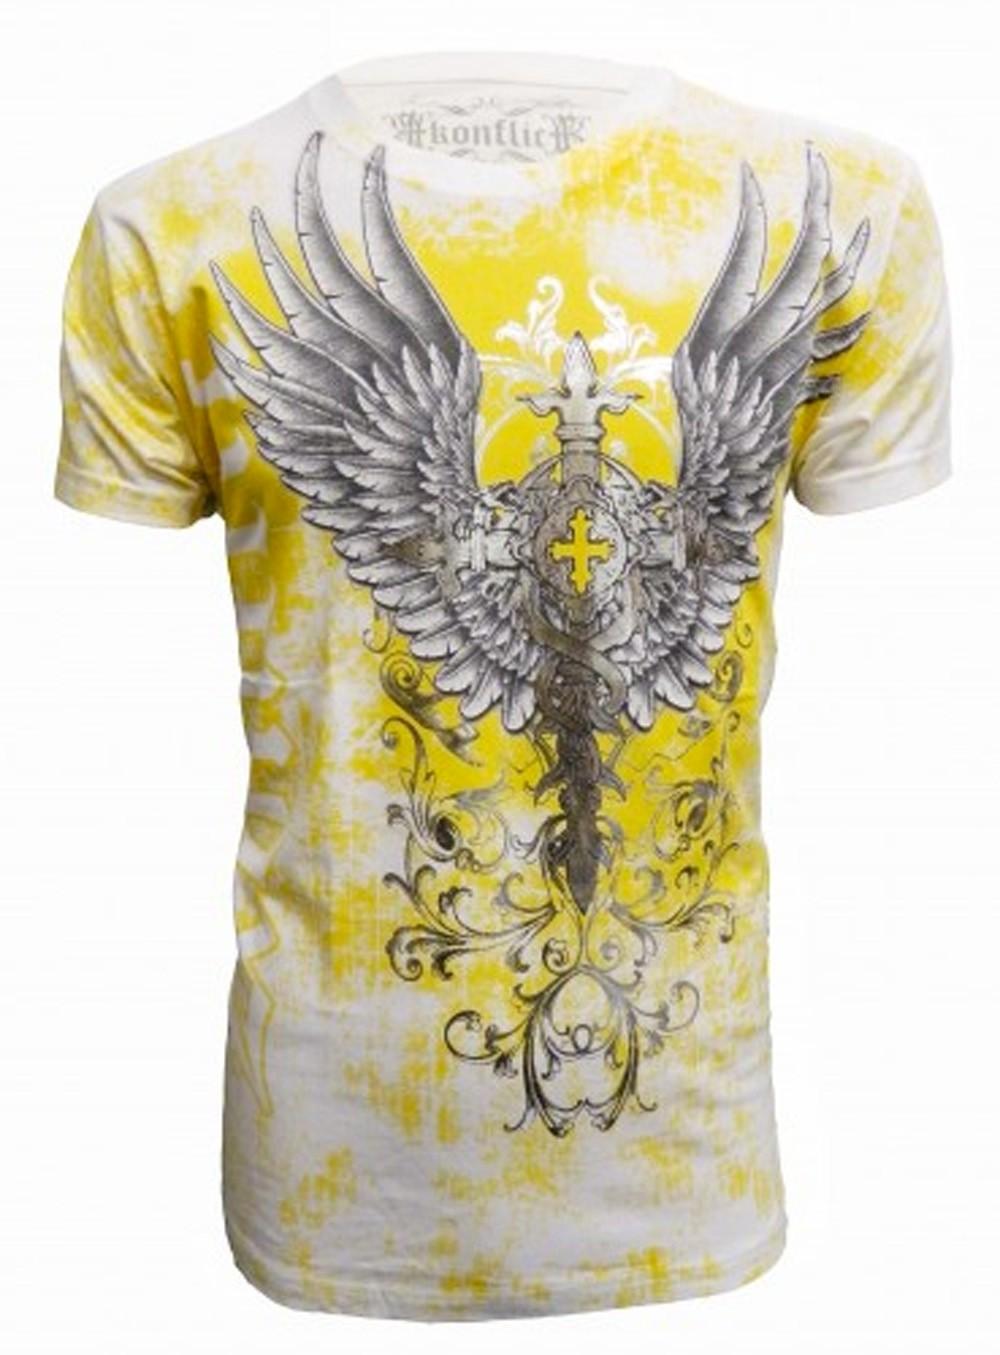 Konflic Clothing - No Regrets T-Shirt